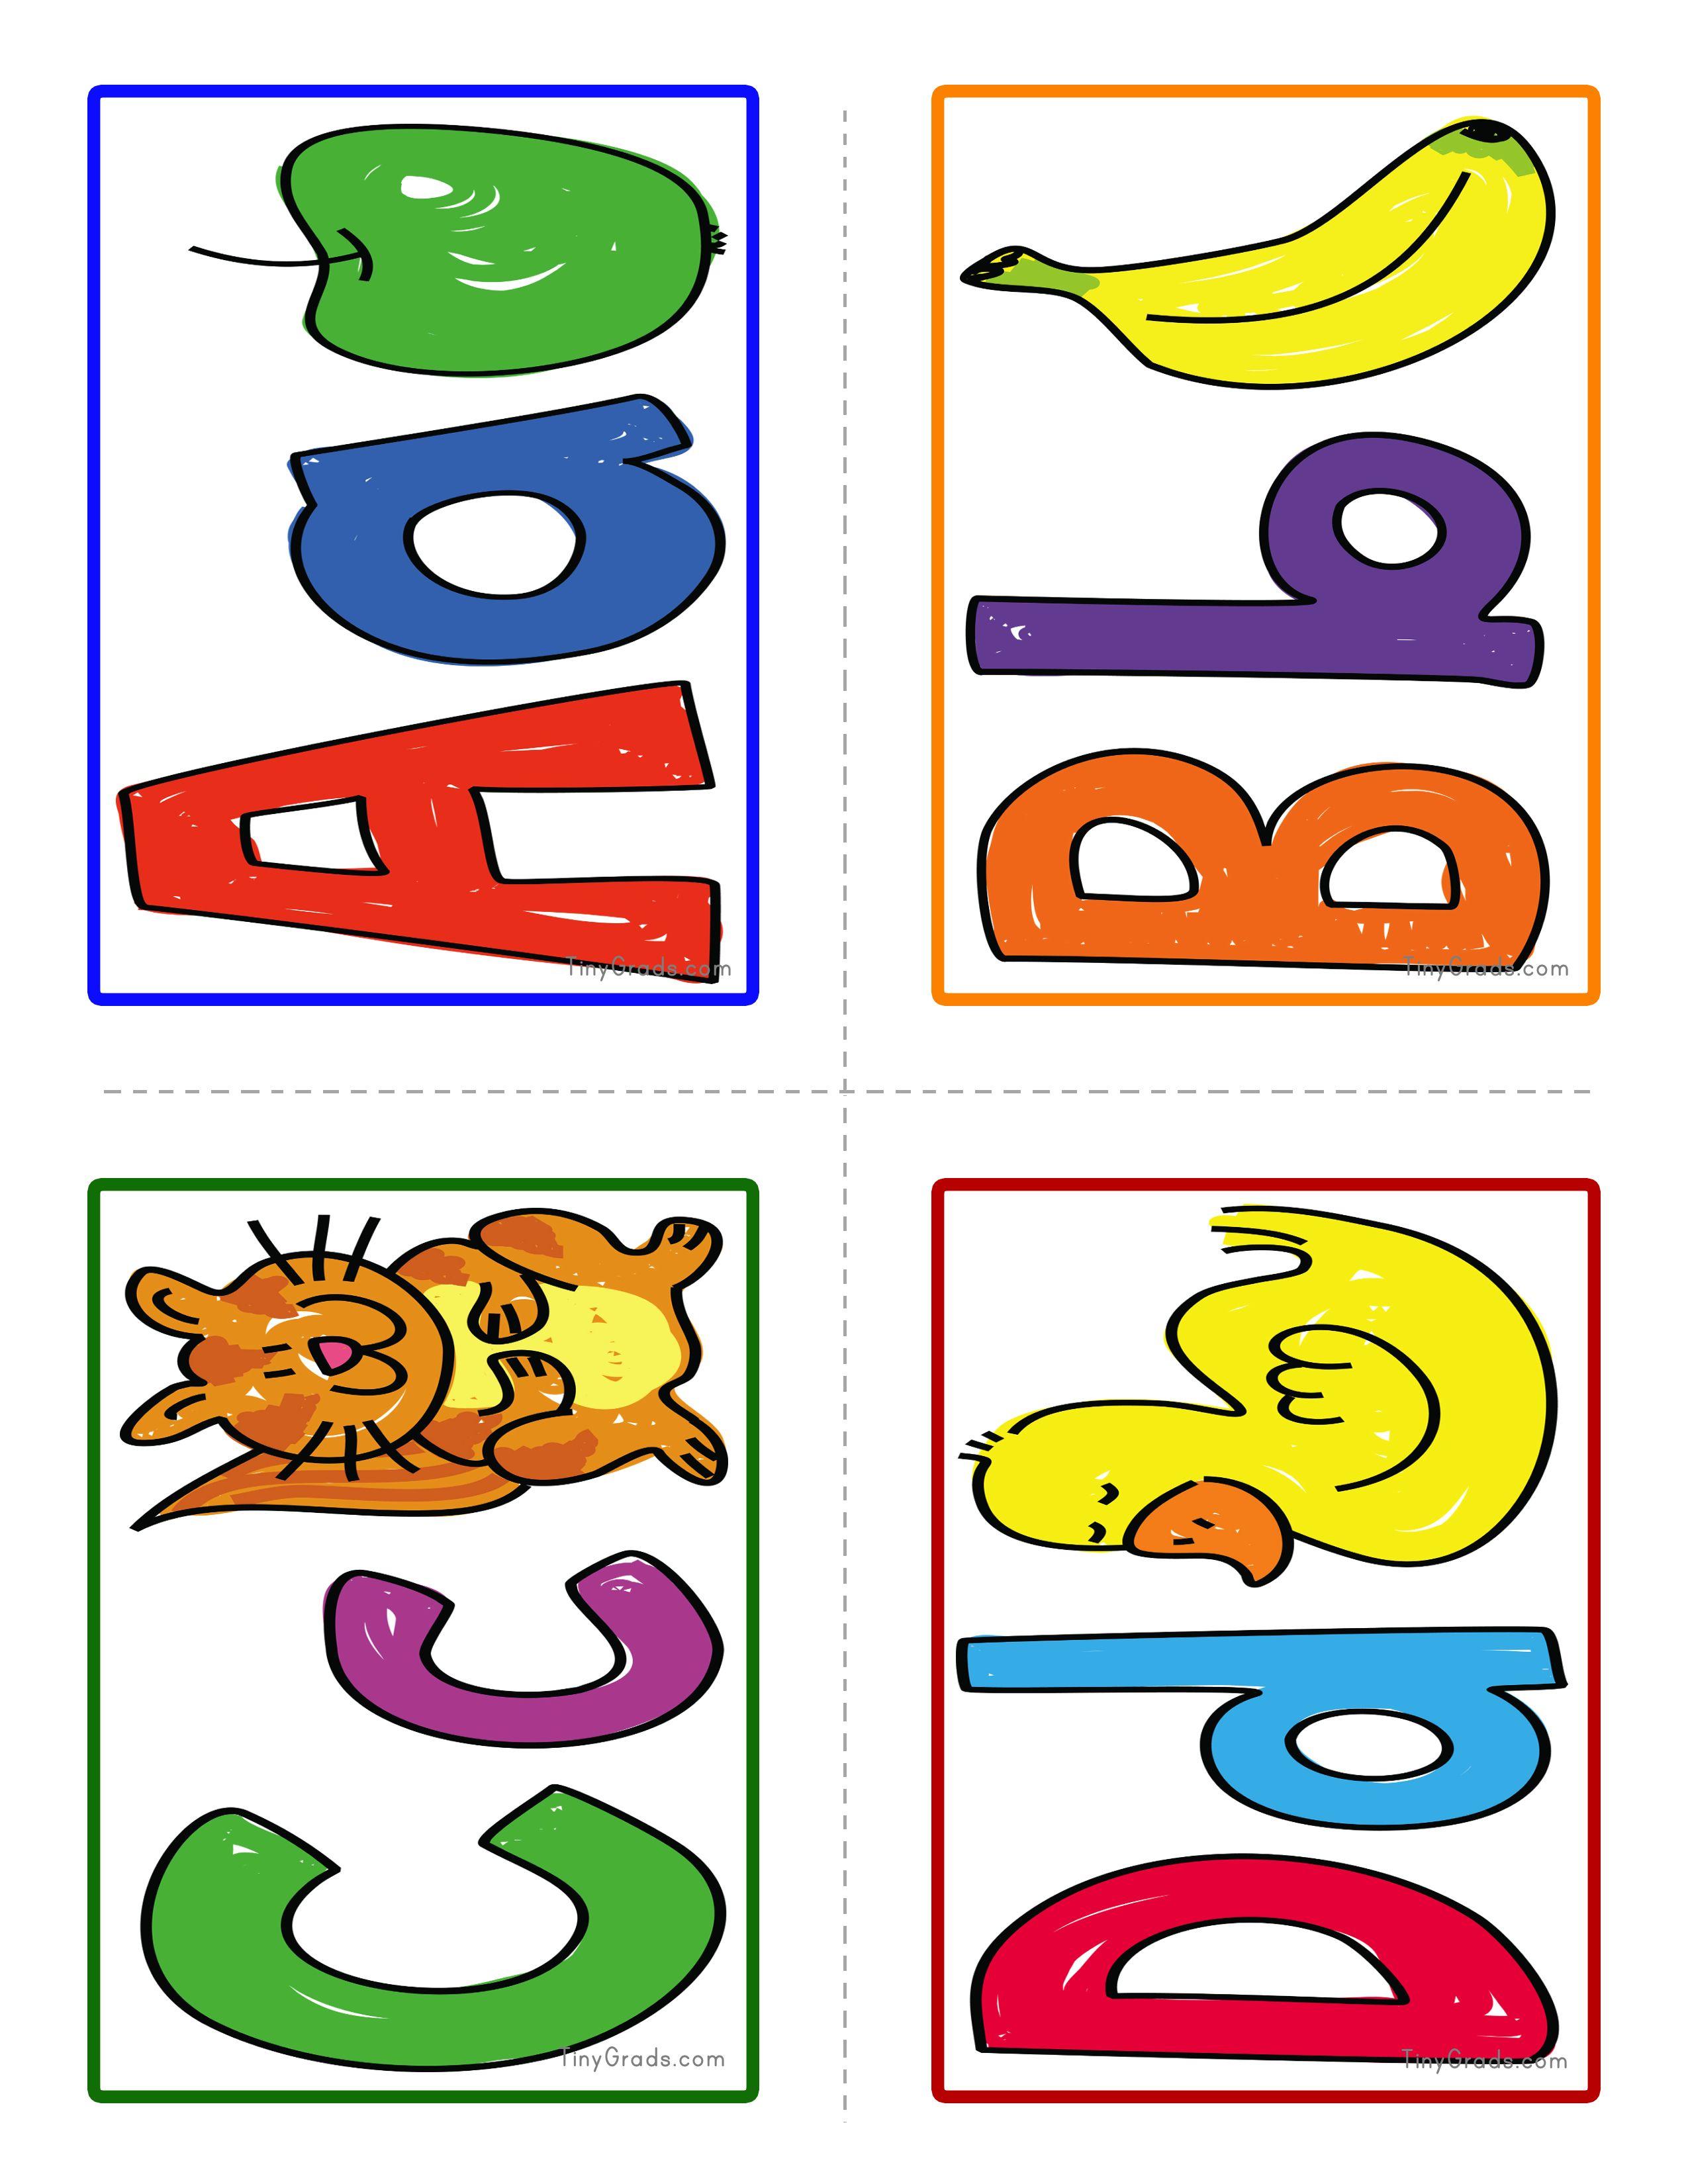 Tinygrads I Alphabet Flash Cards I Simple And